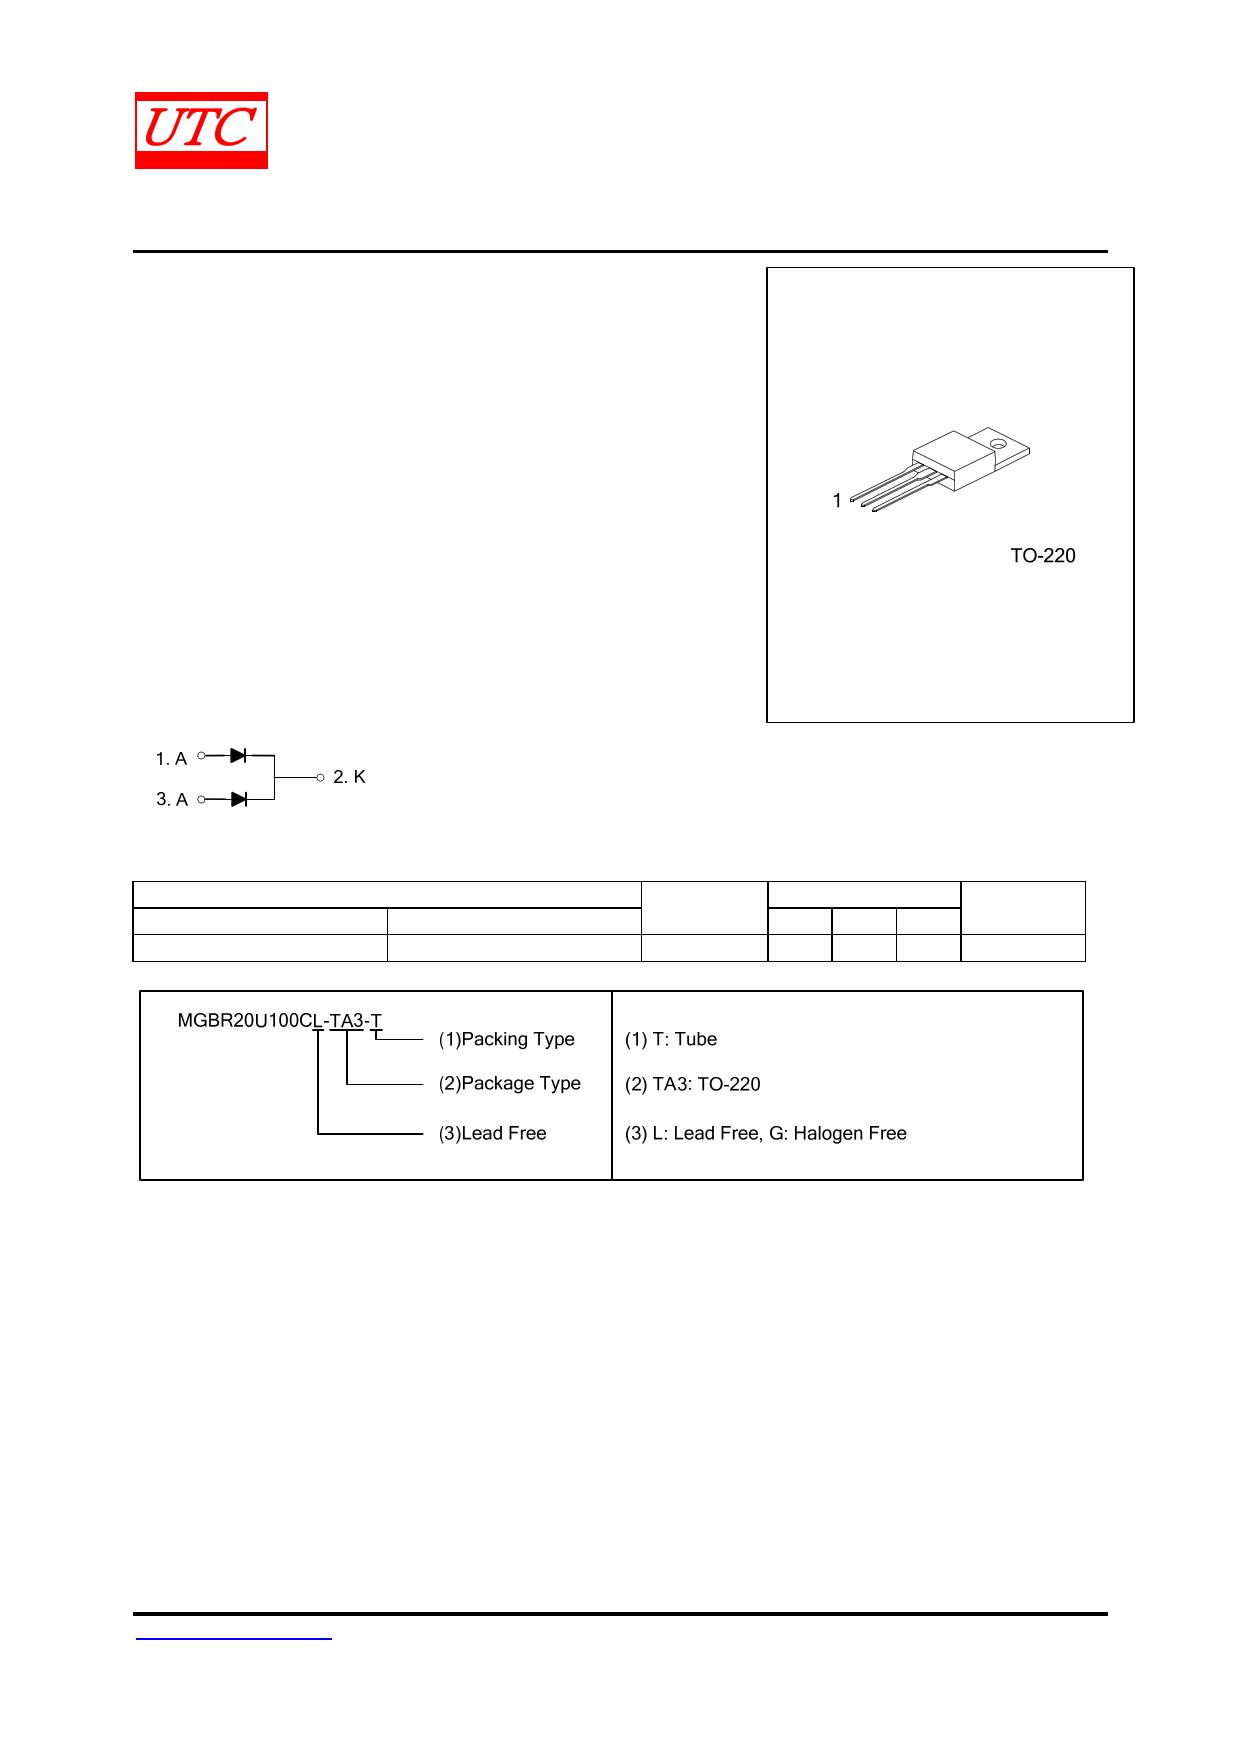 MGBR20U100C 데이터시트 및 MGBR20U100C PDF